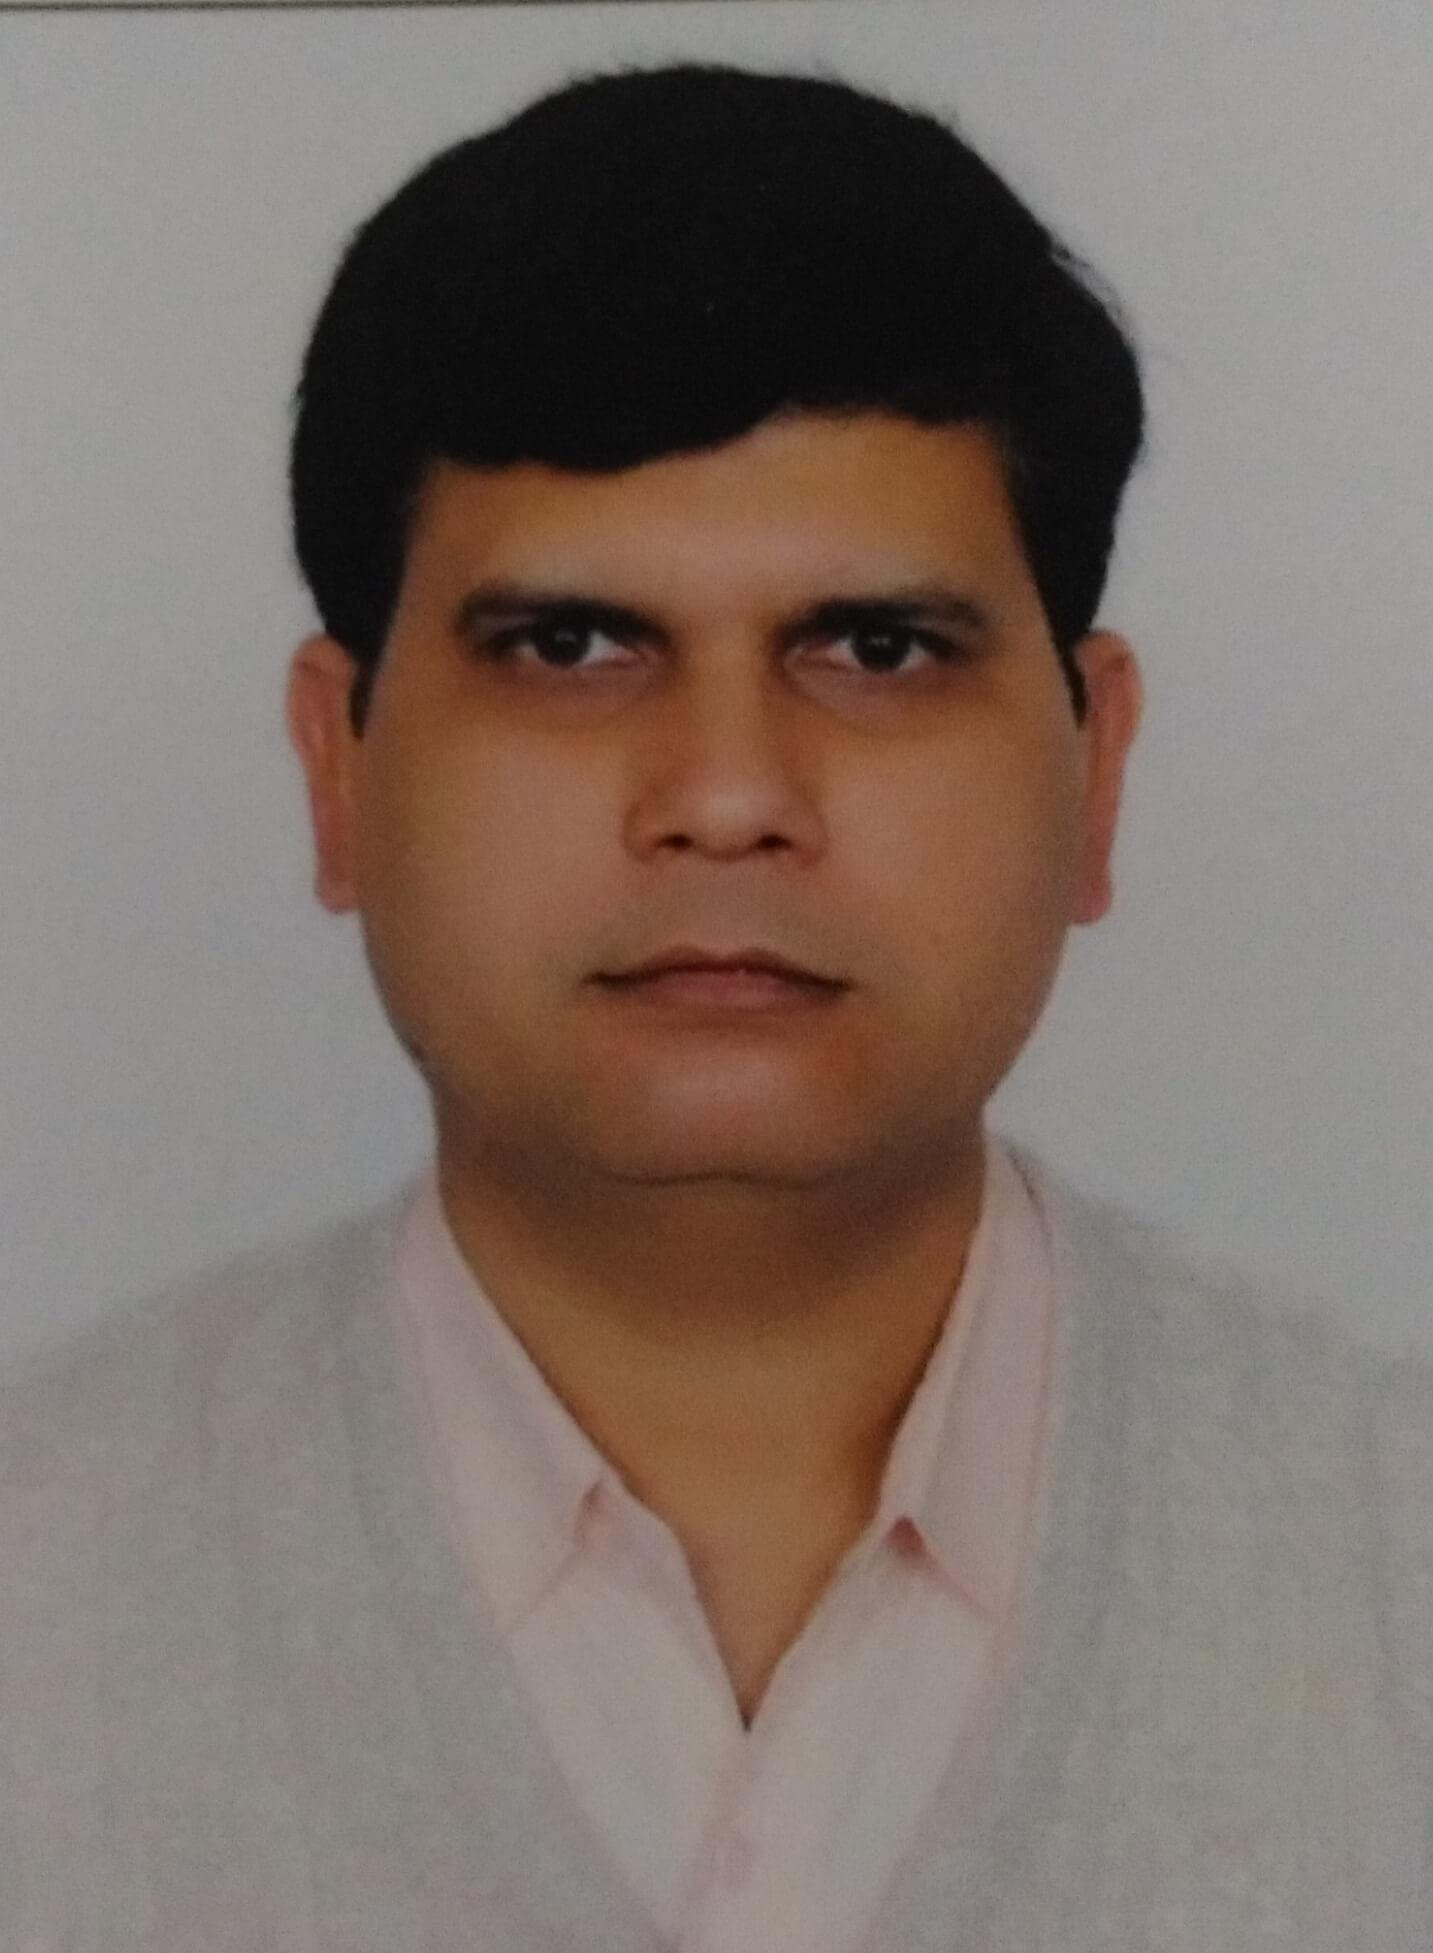 Dr. Pradeep Kumar Pandey